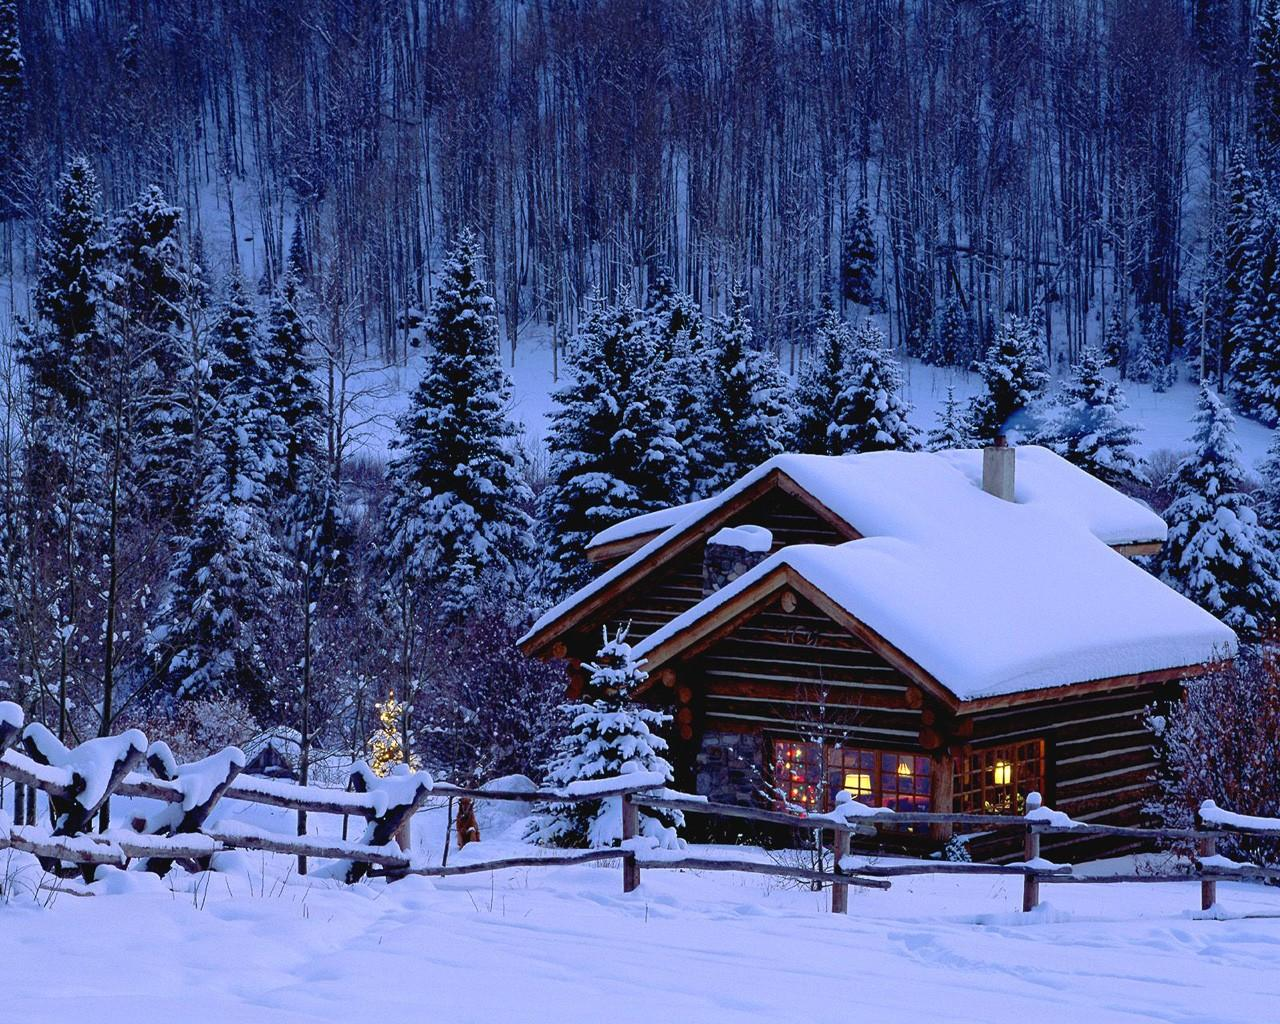 http://4.bp.blogspot.com/-sOxrEW1mYu4/Ta9EGlwib6I/AAAAAAAAACc/_Dh8pm28SuE/s1600/Winter.jpg